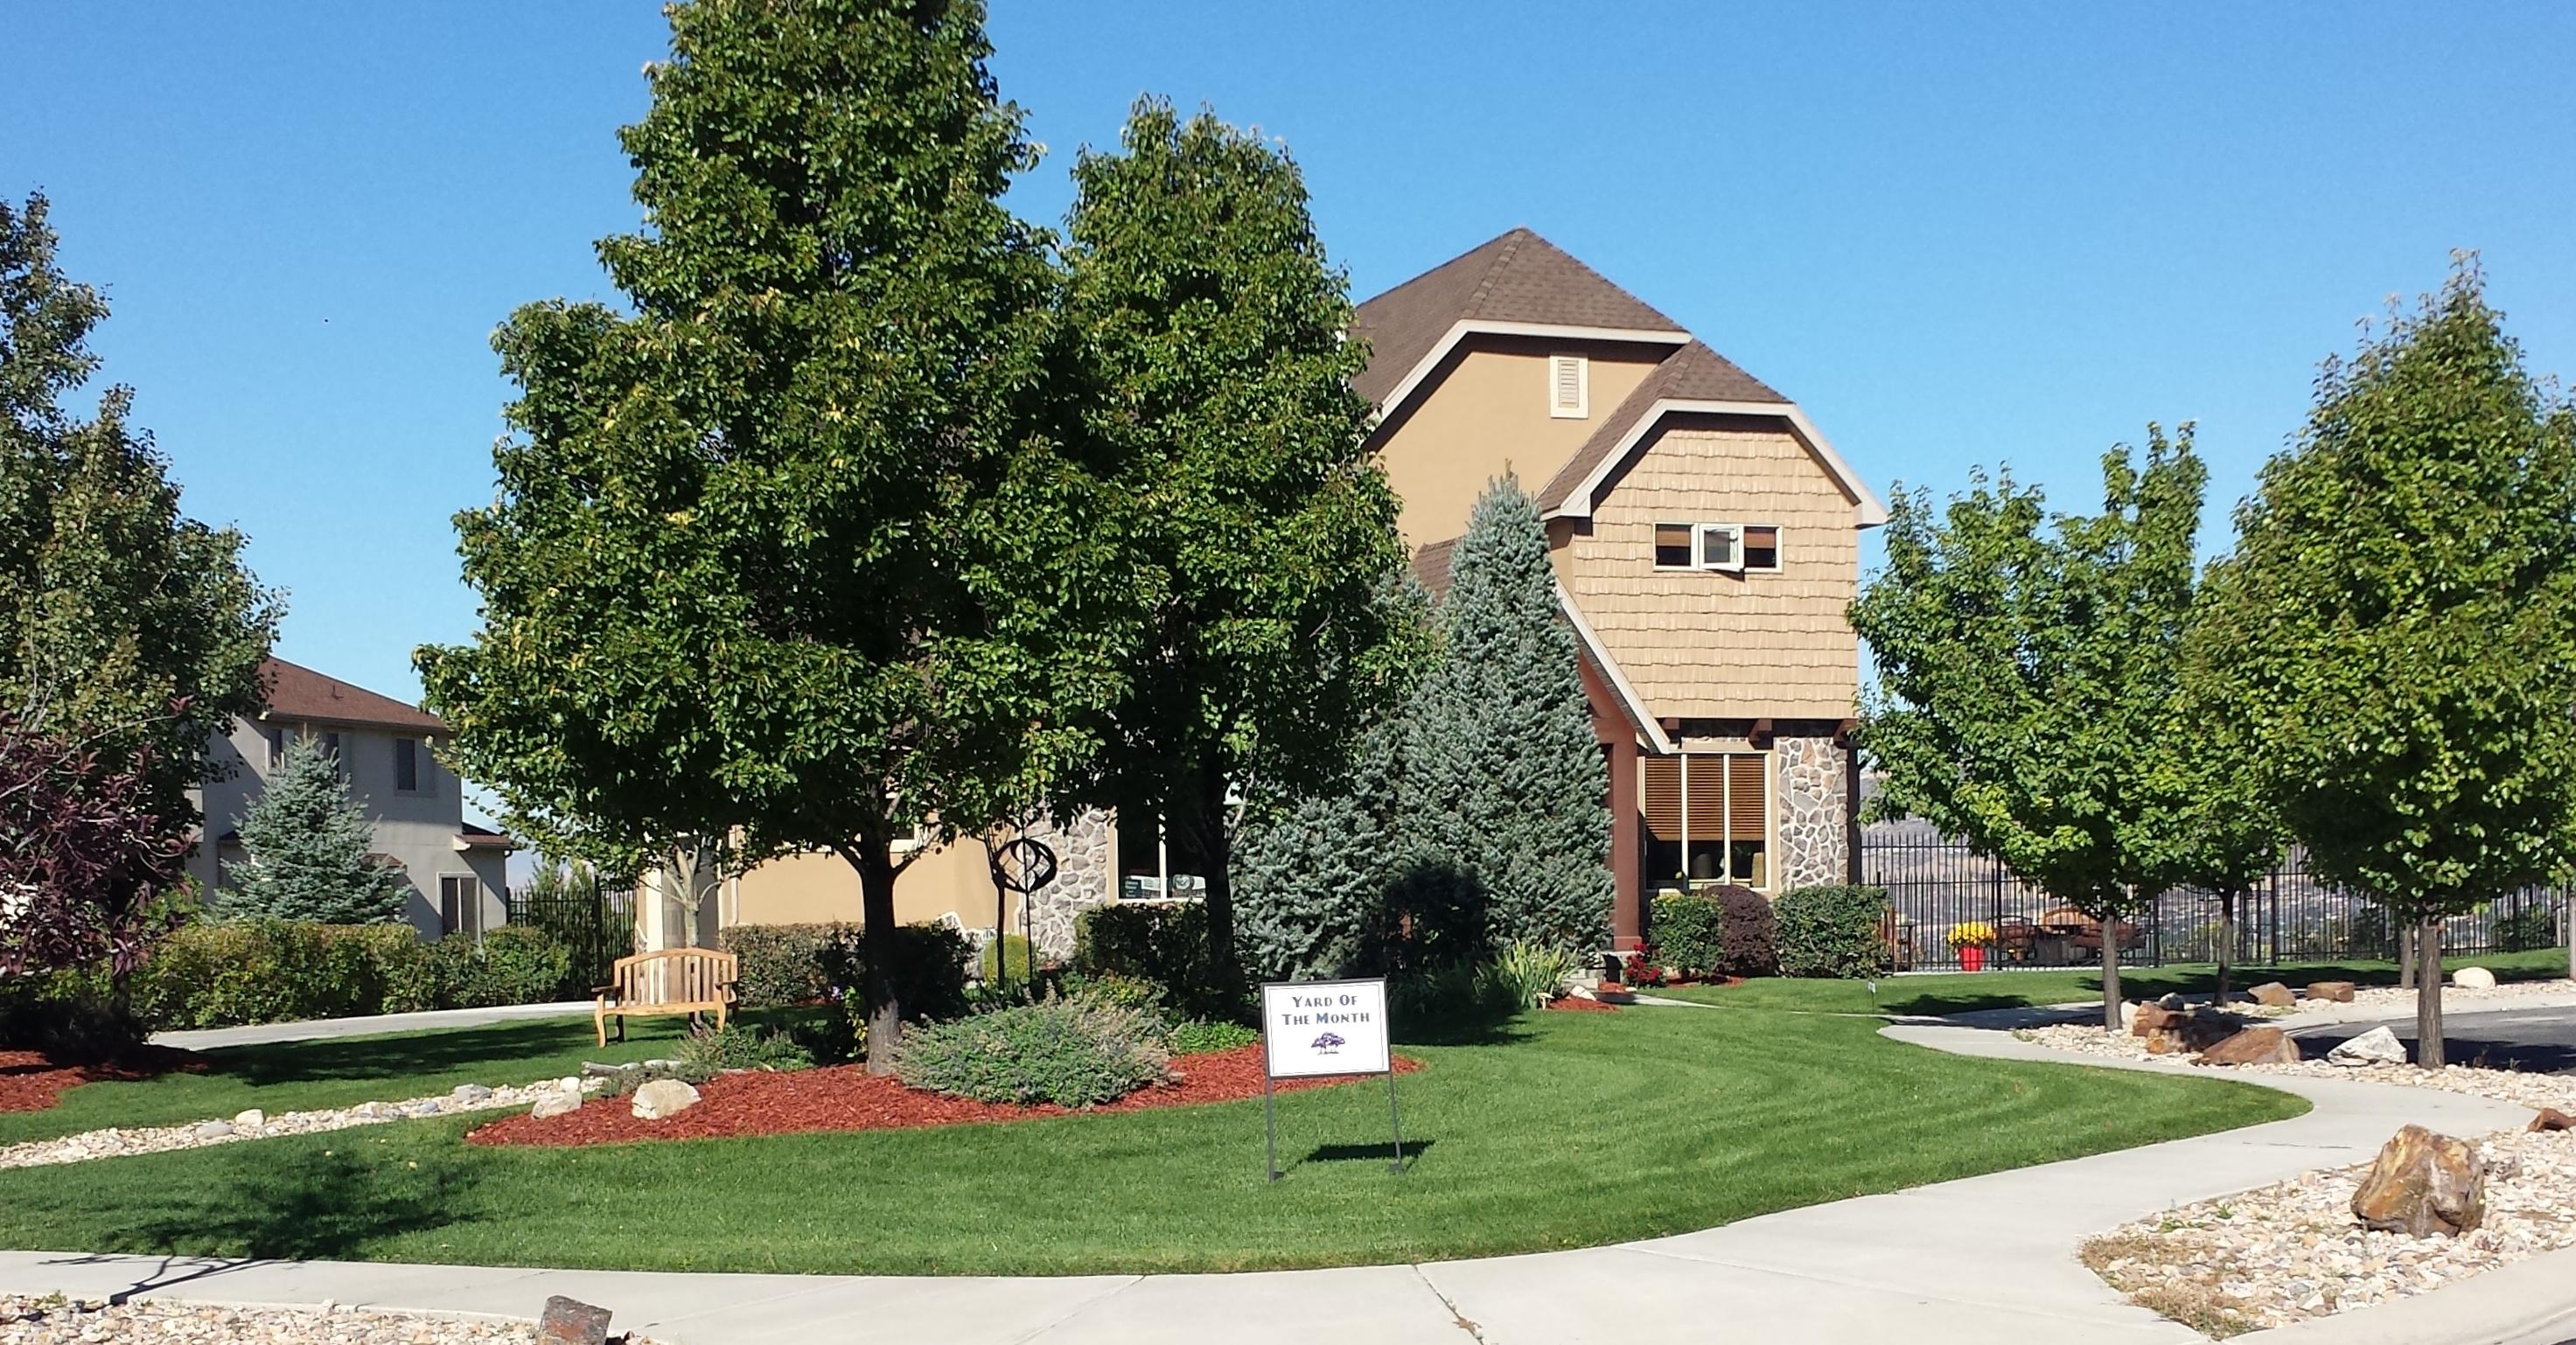 The Pollock Residence -10785 N Sheridan